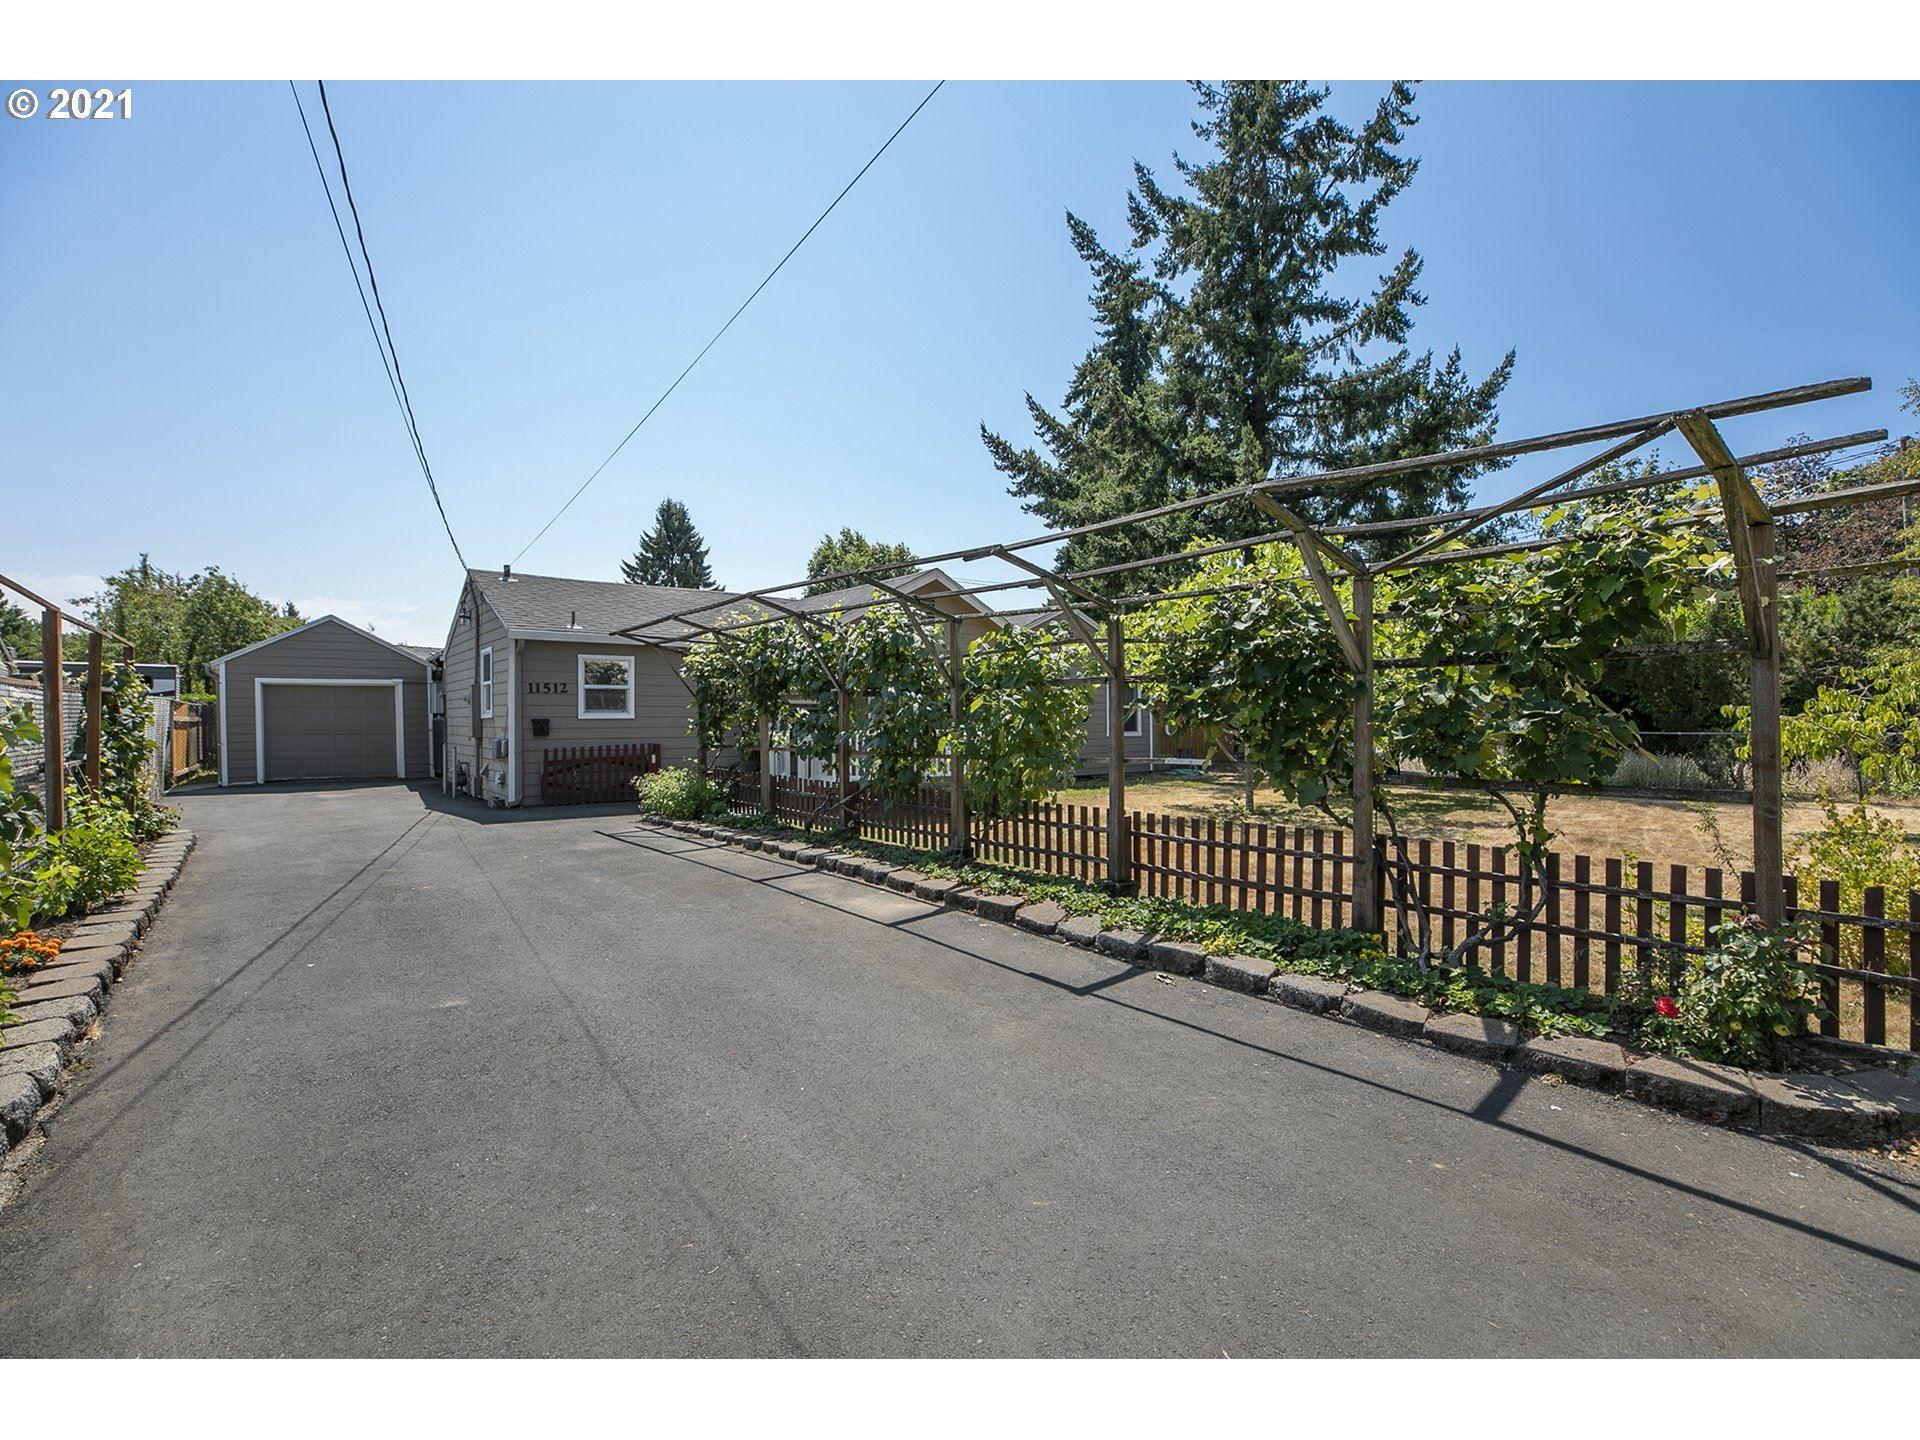 11512 NE SISKIYOU ST, Portland, OR 97220 - MLS#: 21461568